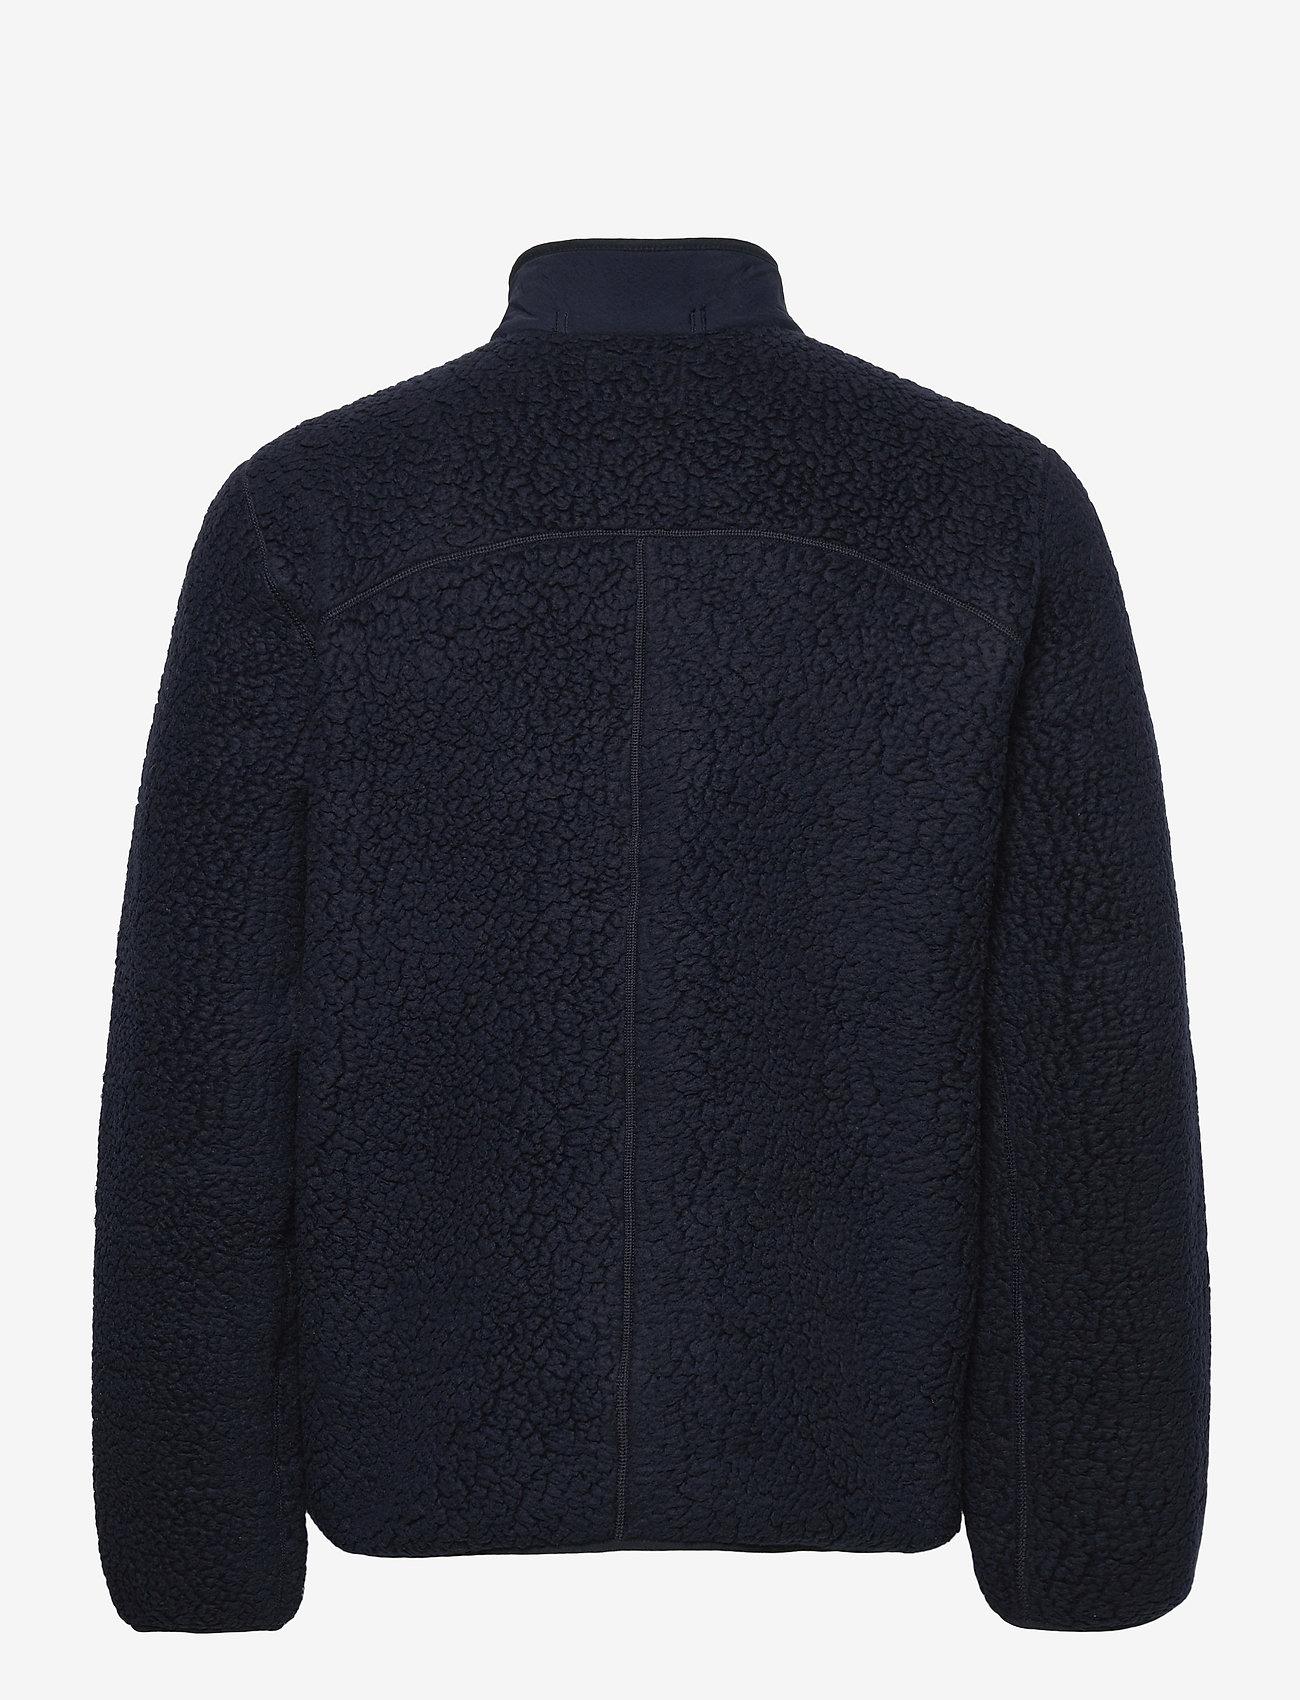 J.Crew - Polar Sherpa Fz Jkt - basic-sweatshirts - blue - 1